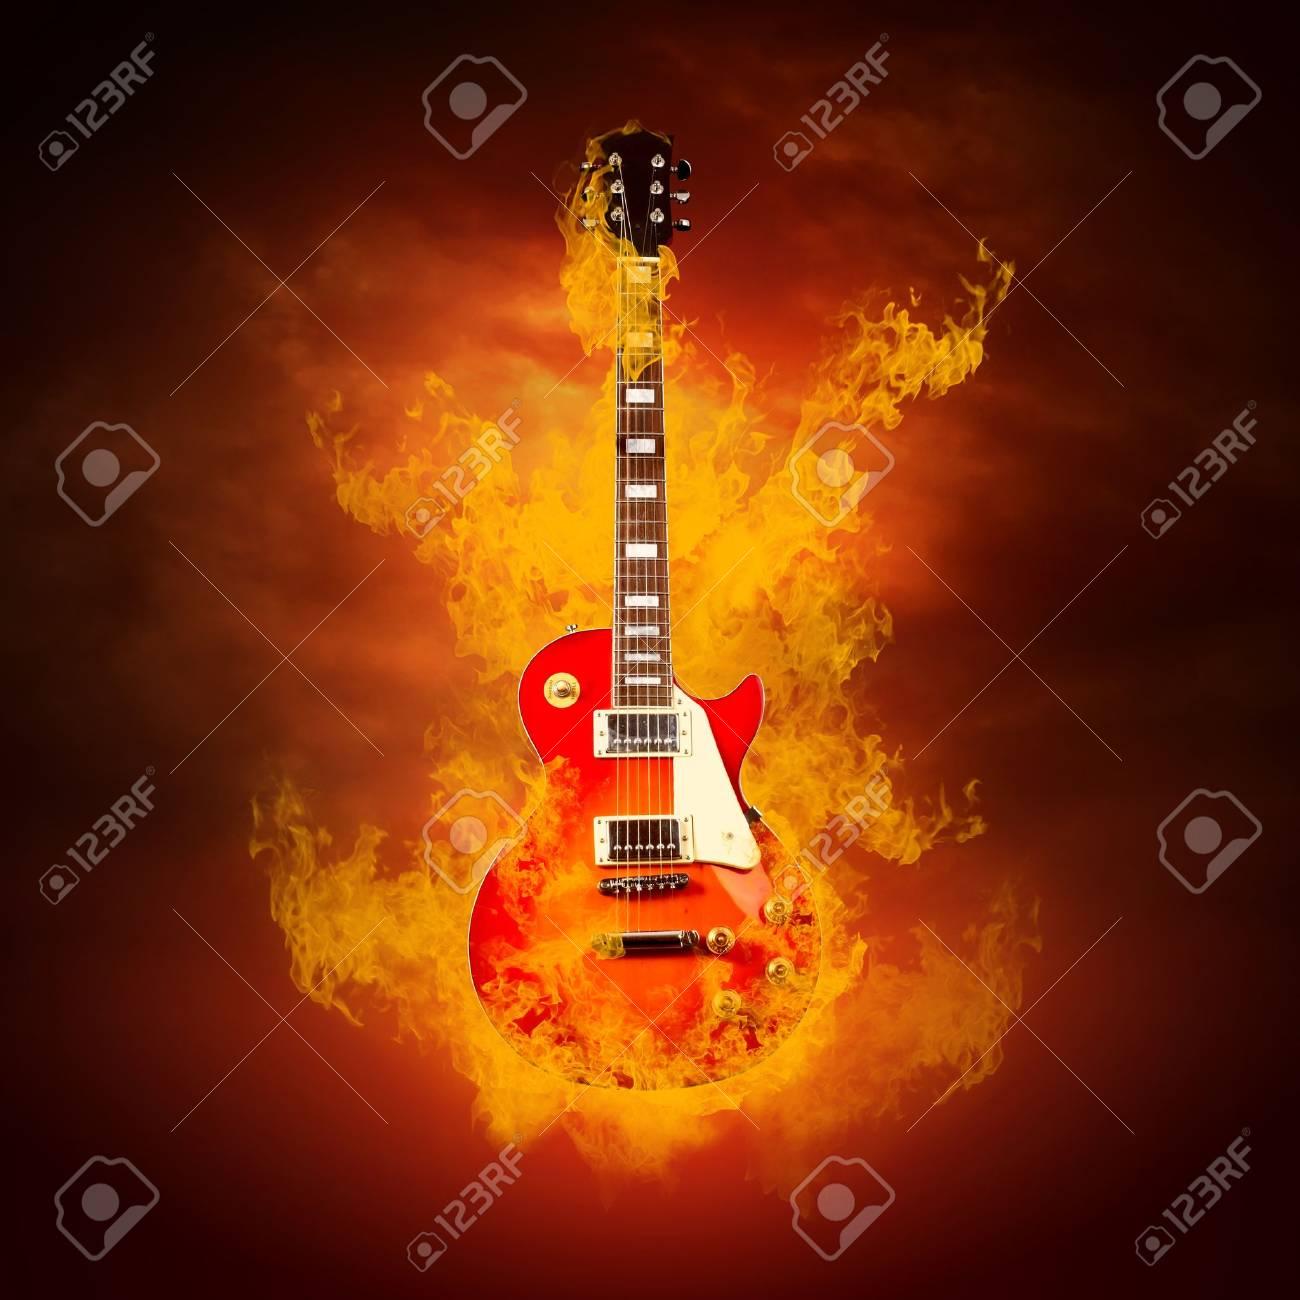 Rock guita in flames of fire Stock Photo - 9648728